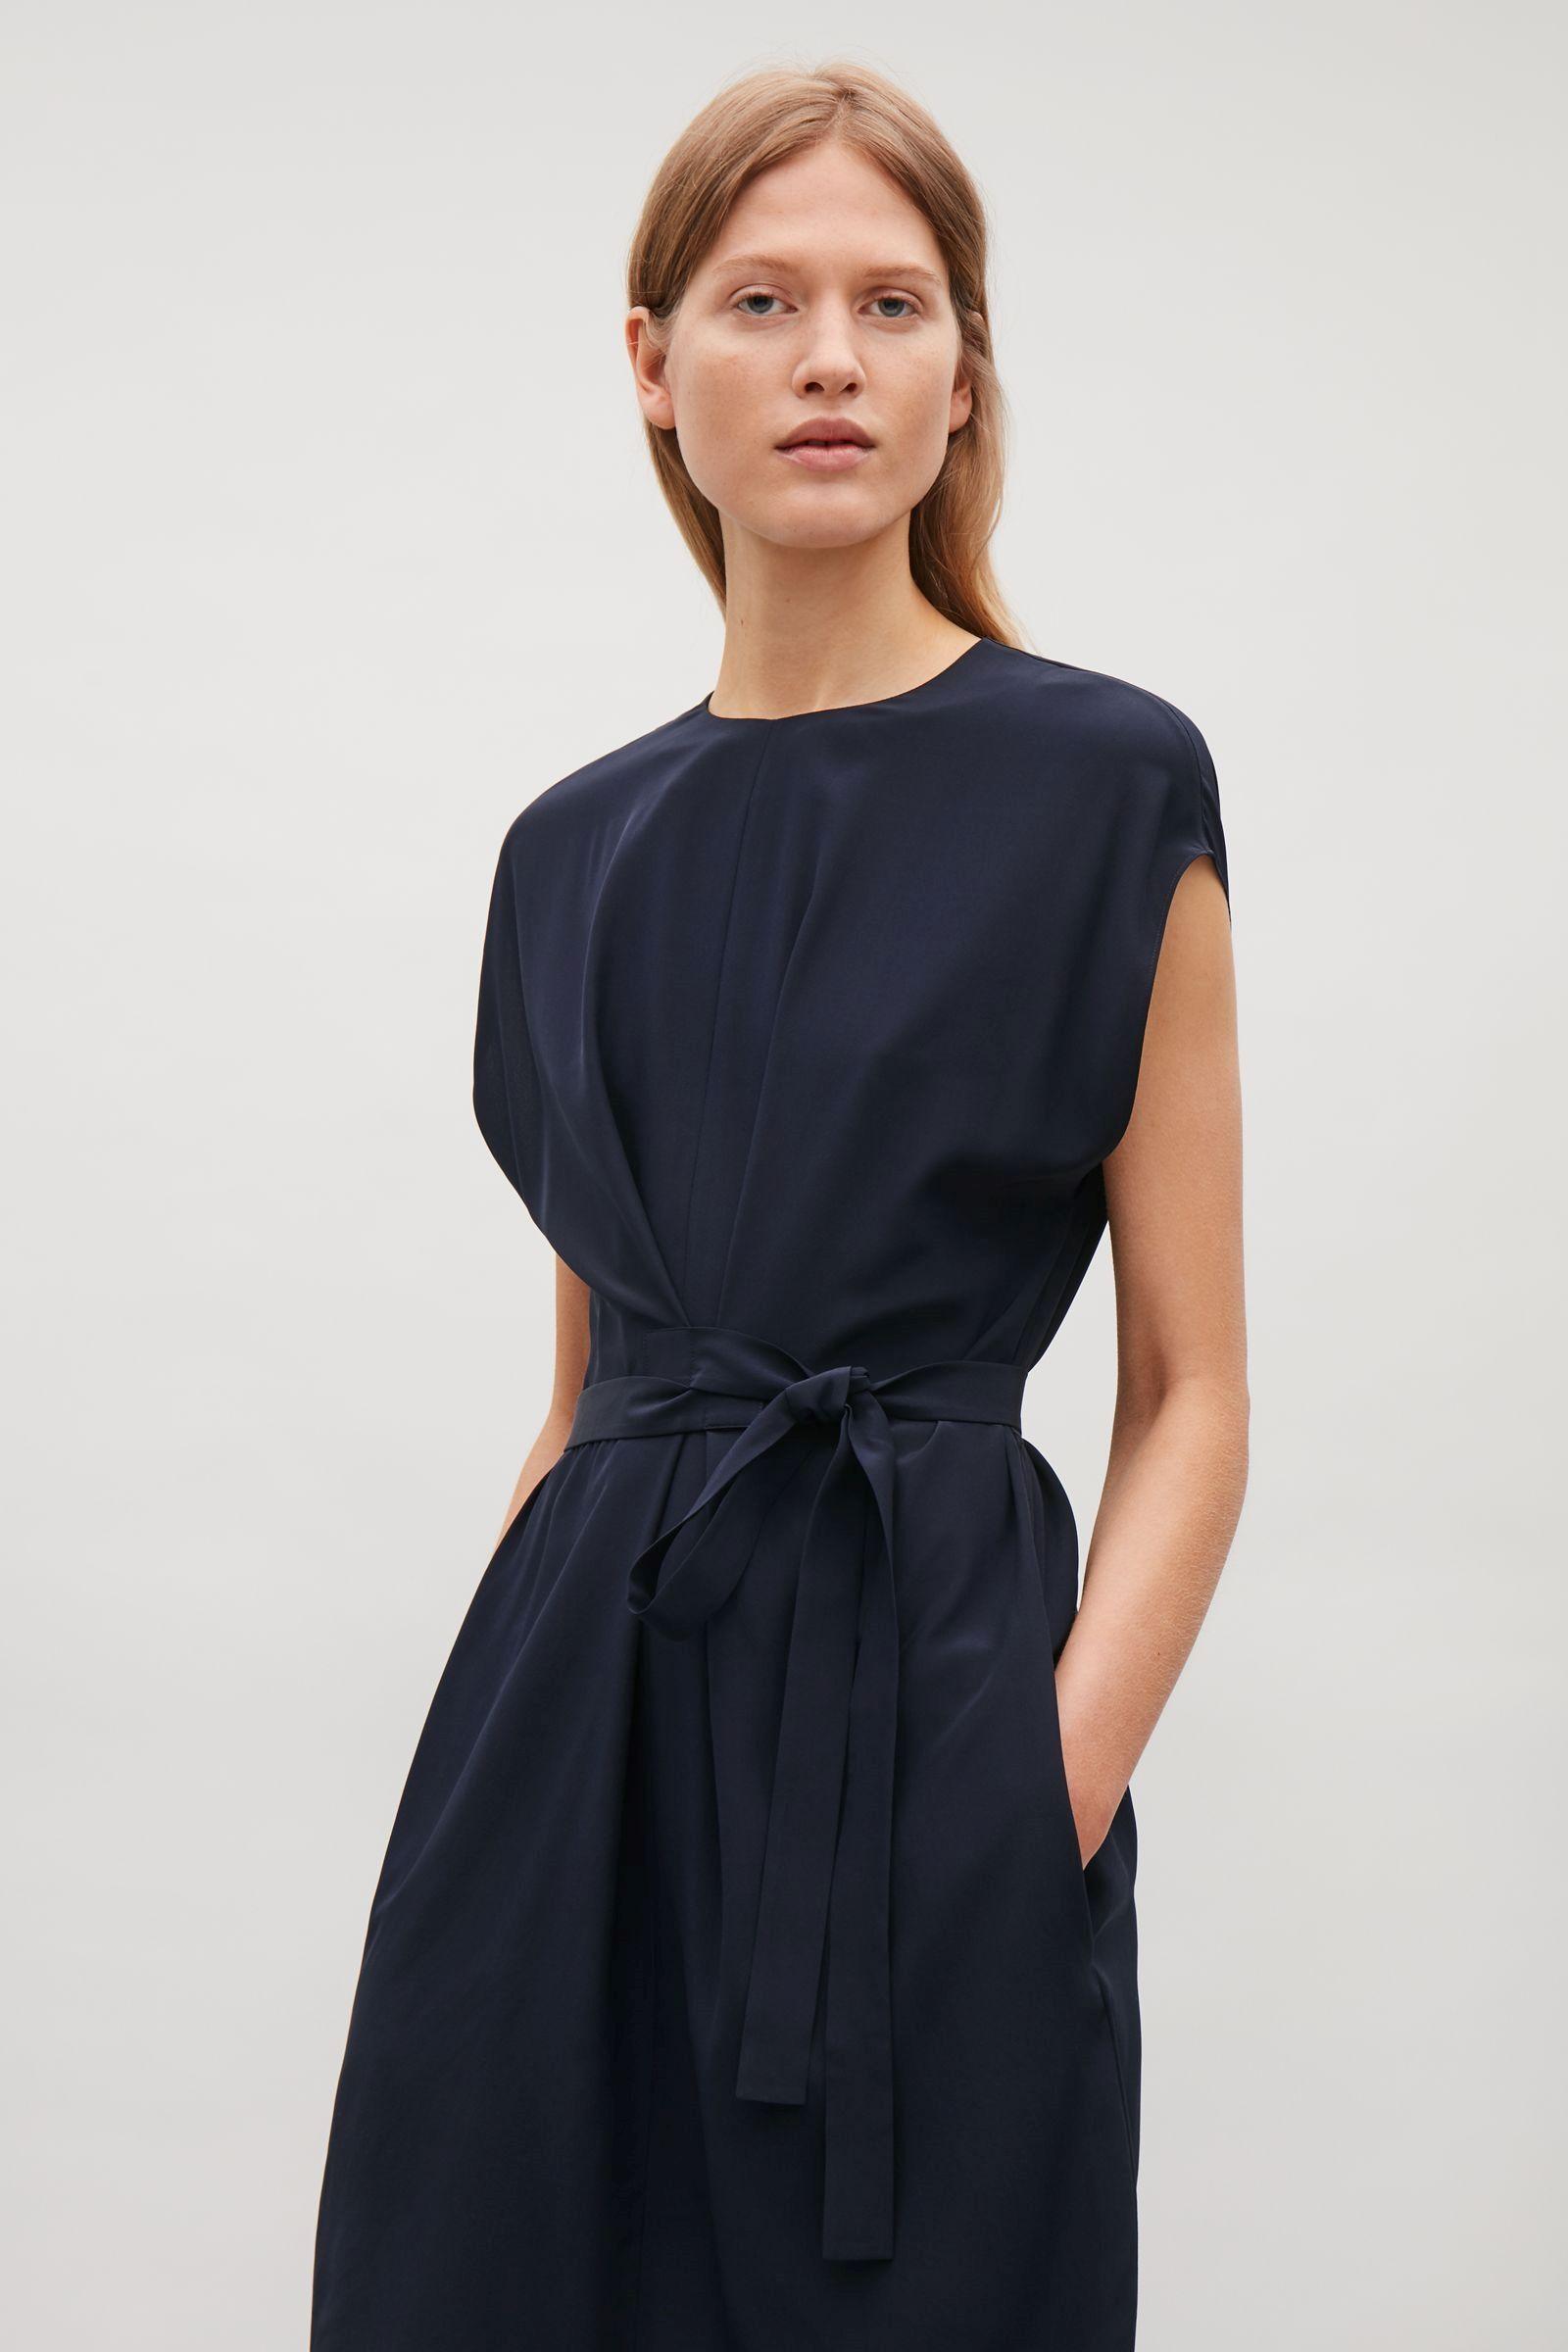 Betere COS image 2 of Silk dress with wrap tie in Navy | Jurk! - Jurken PI-93